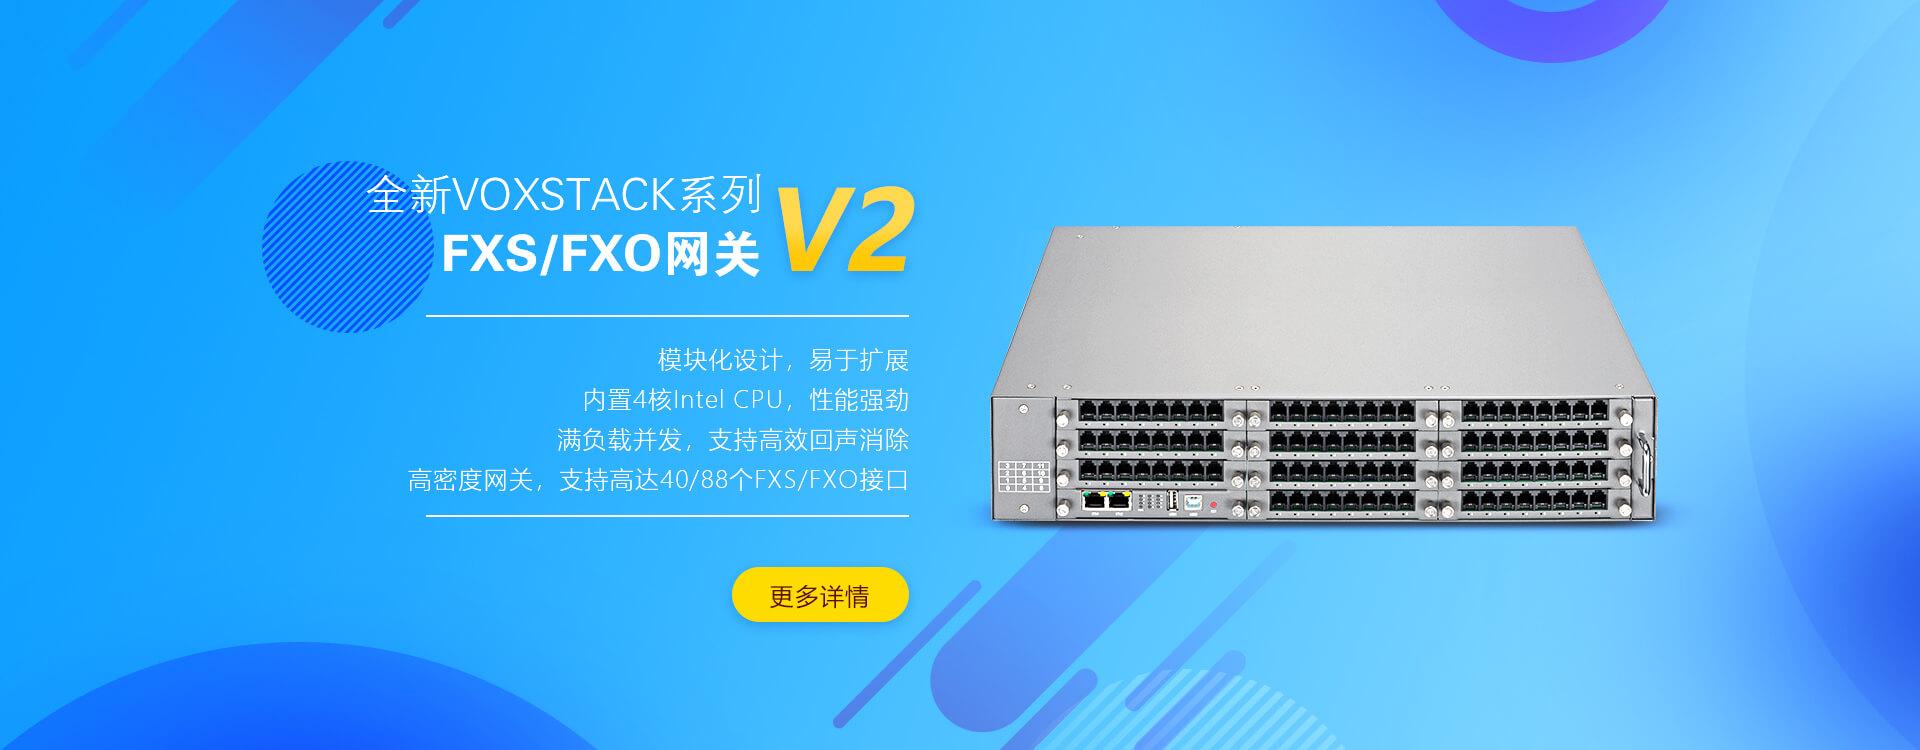 FXSO-V2-cn